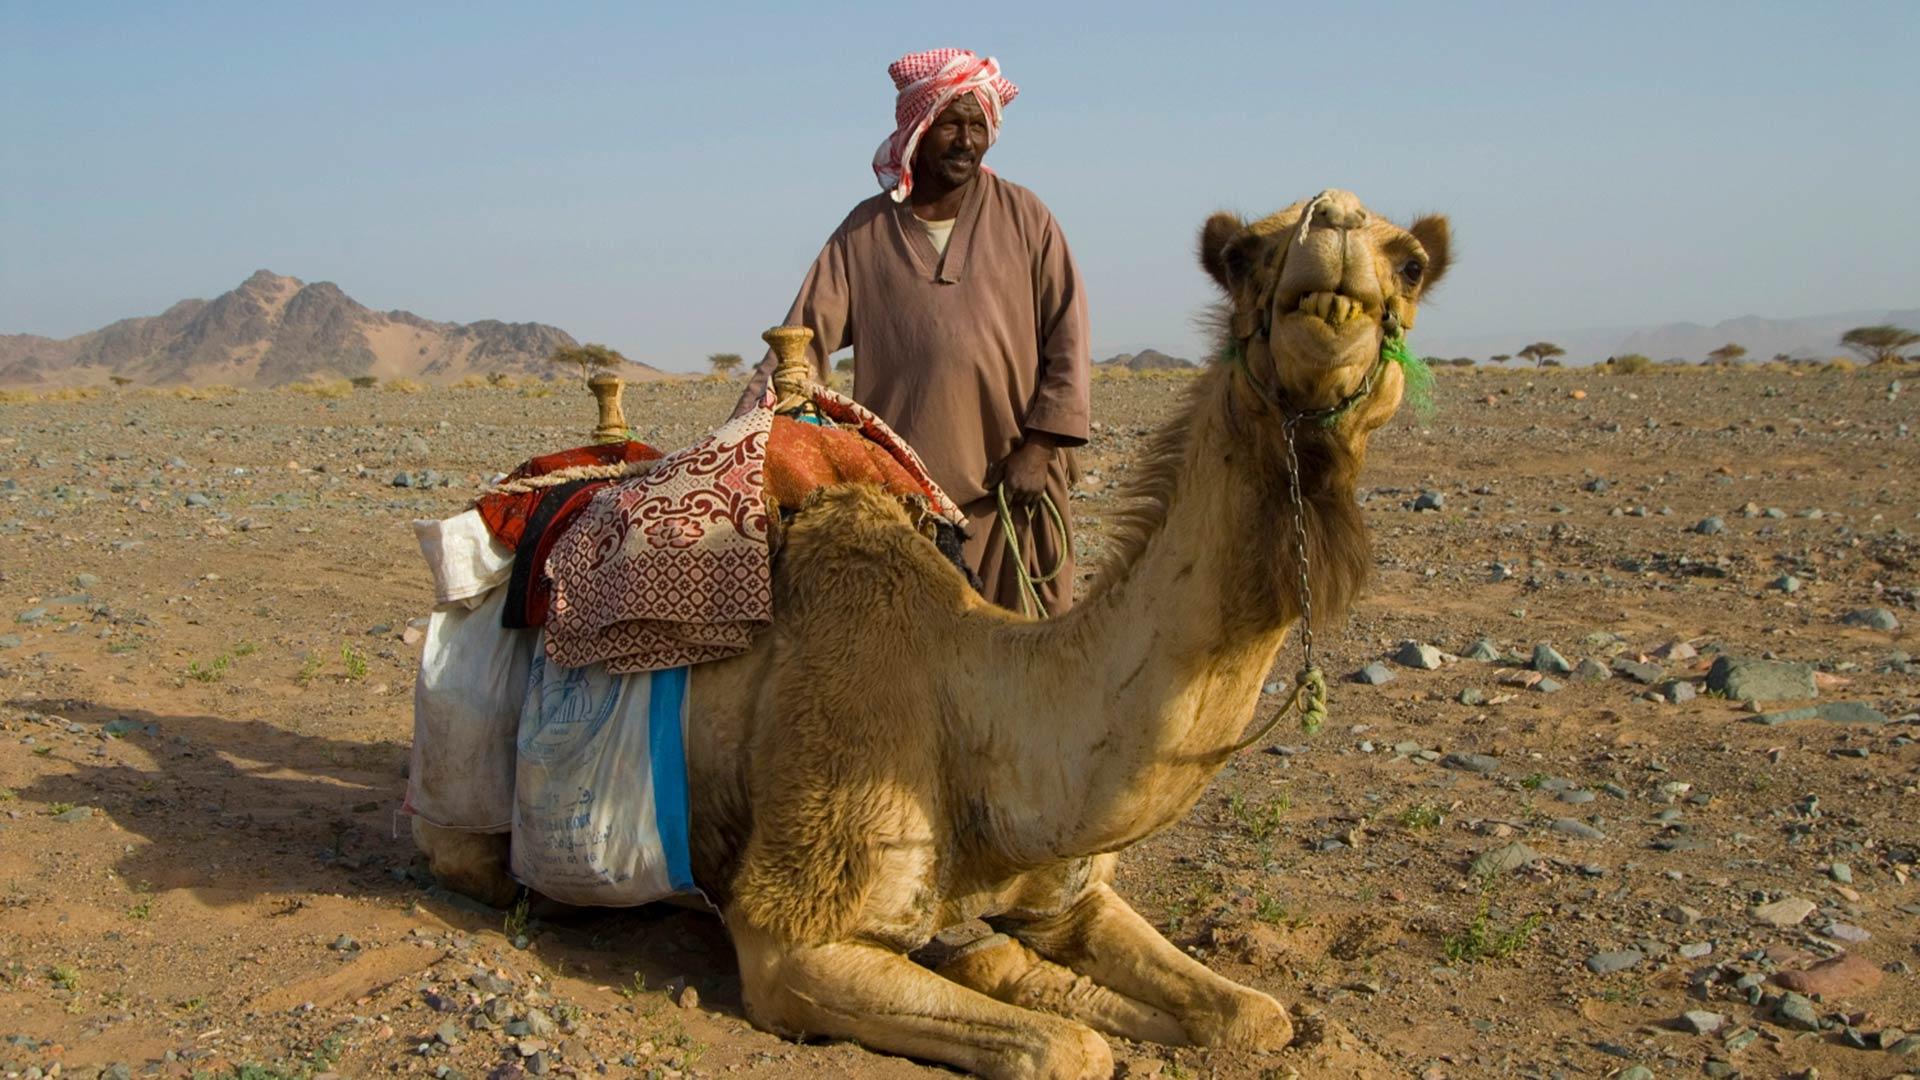 Shepherd and camel in the desert in Saudi Arabia